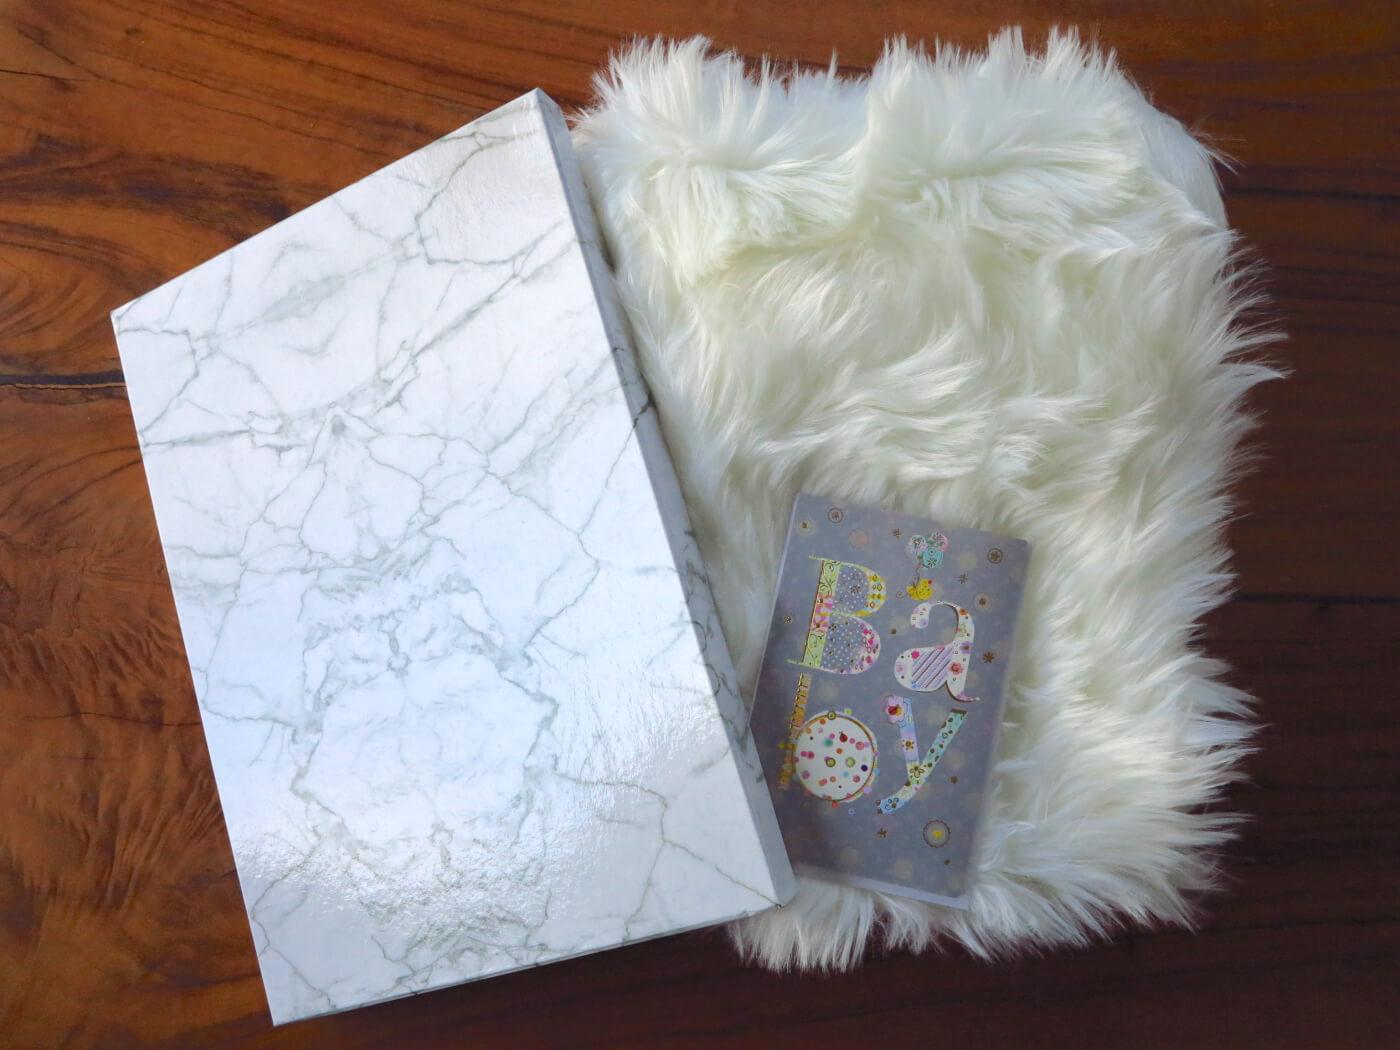 Picture of: Jacinda Ardern S Baby Gift From Peta A Faux Sheepskin Rug Media Centre Peta Australia